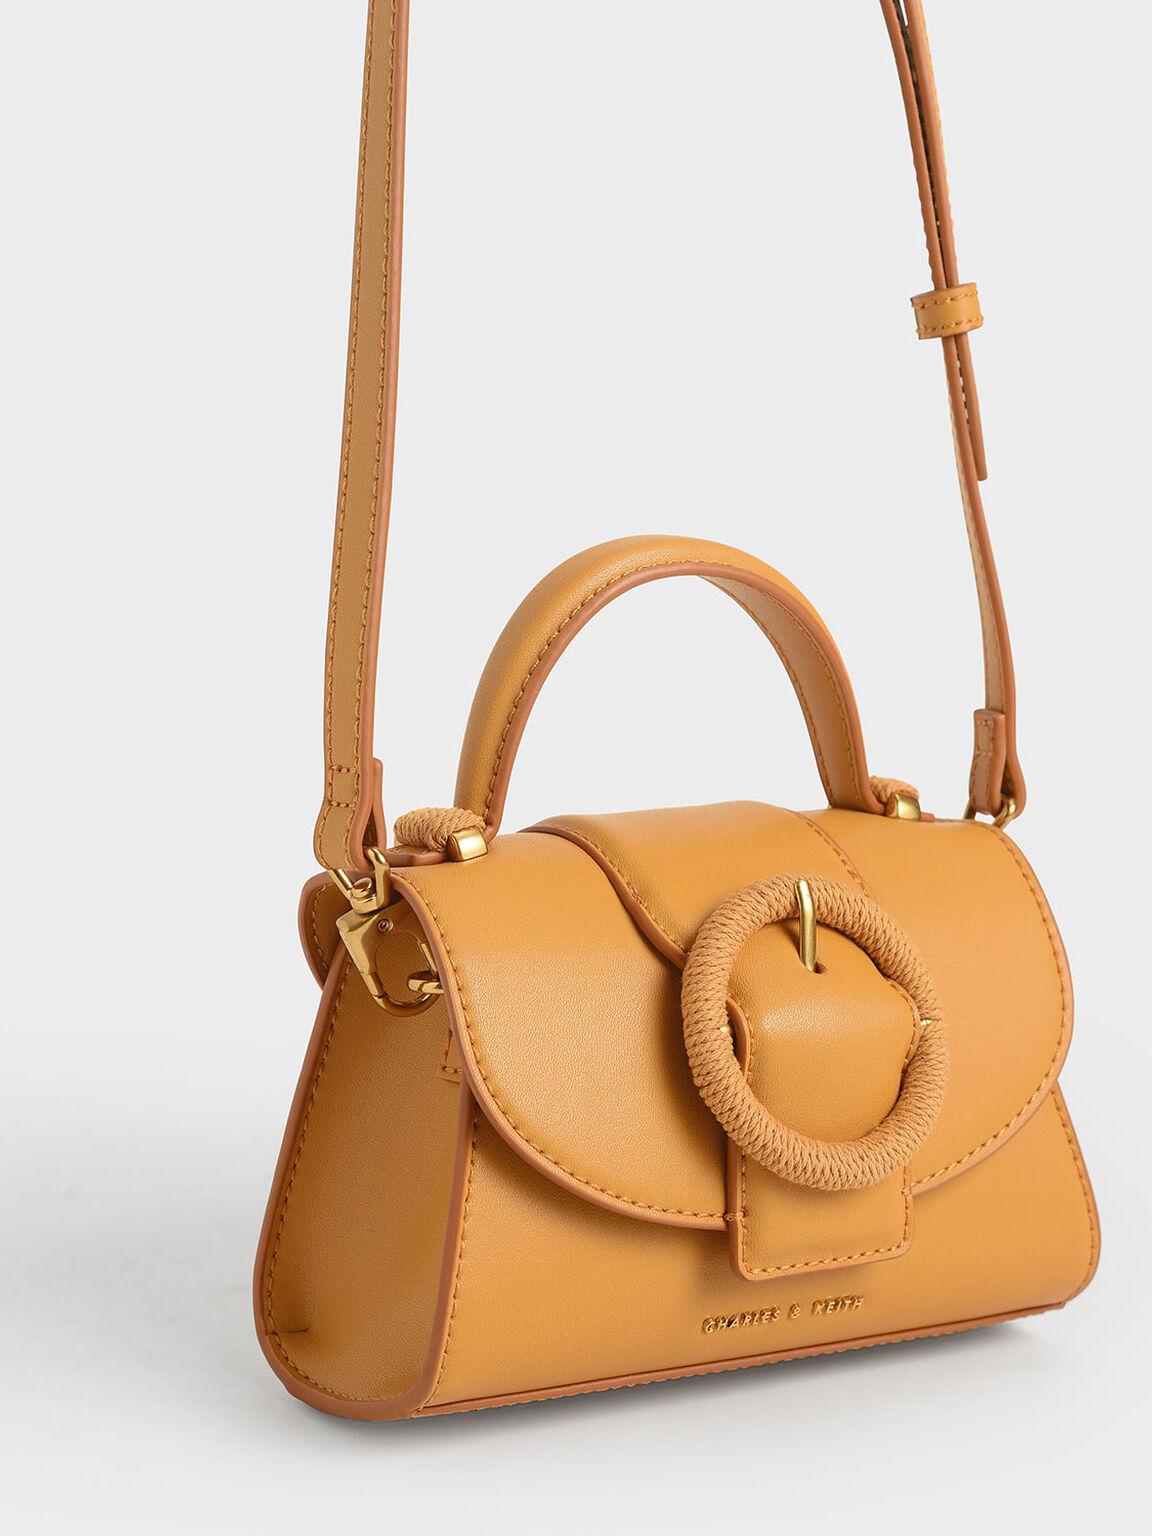 Woven Buckle Top Handle Bag, Mustard, hi-res